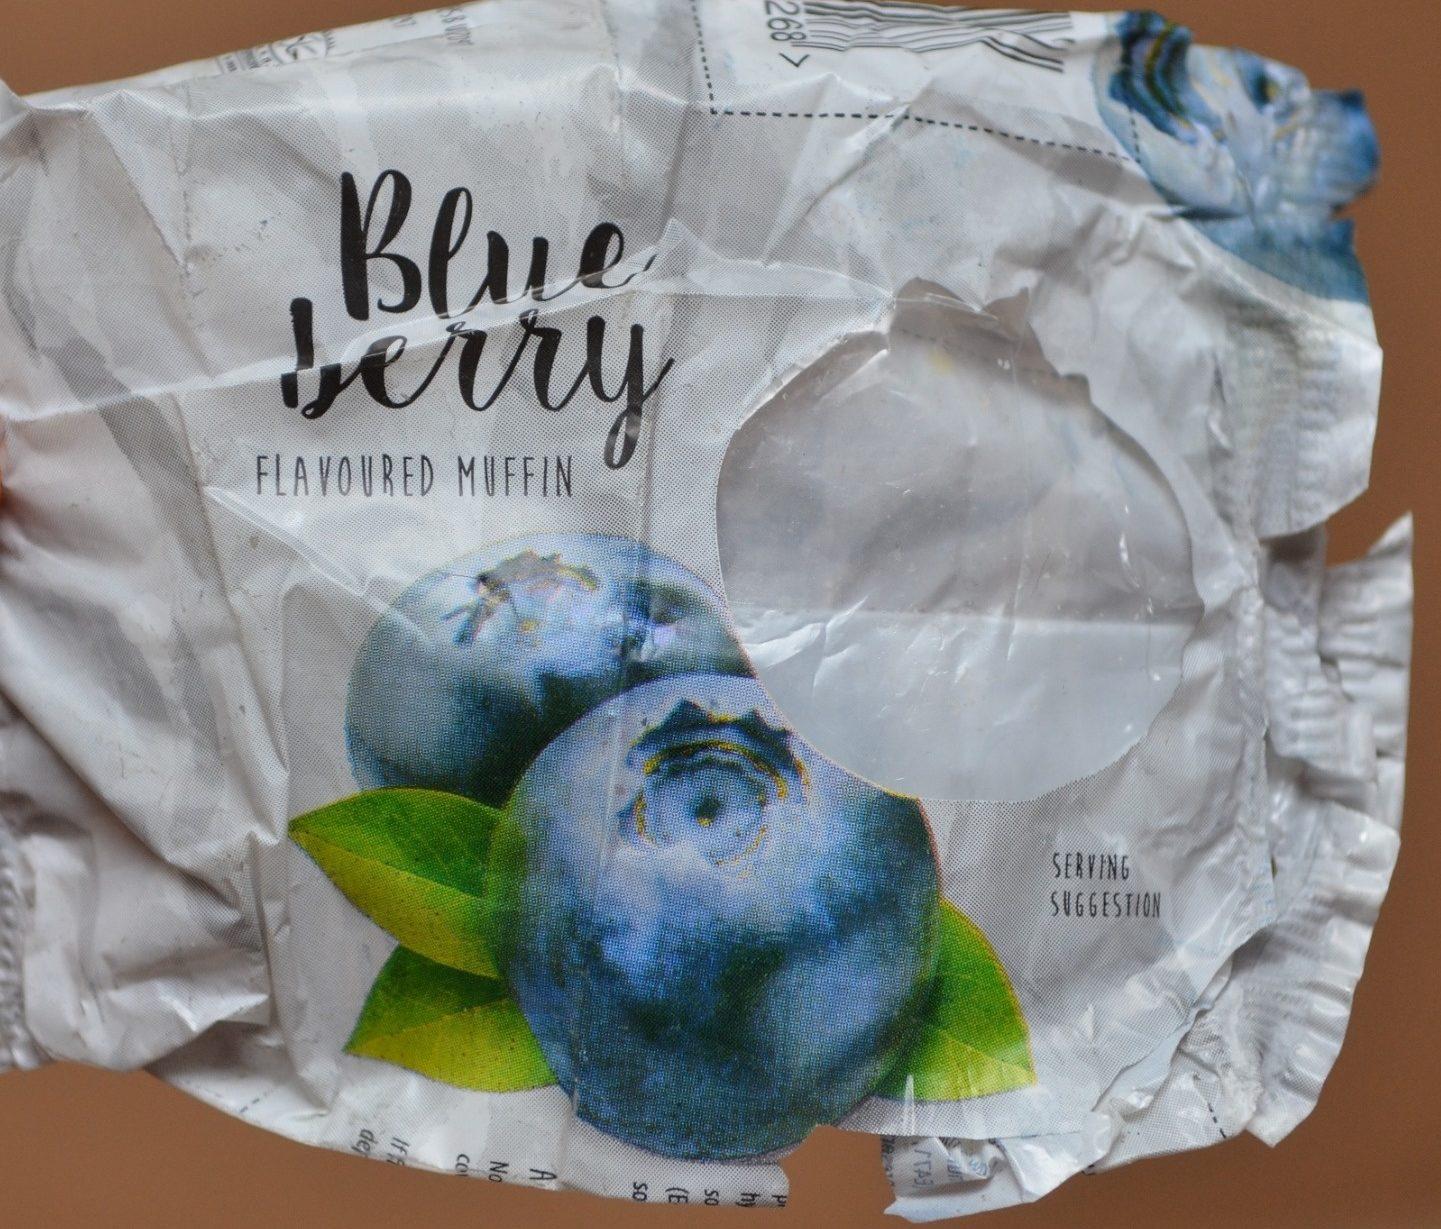 Blueberry Flavoured Muffin - Produit - fr